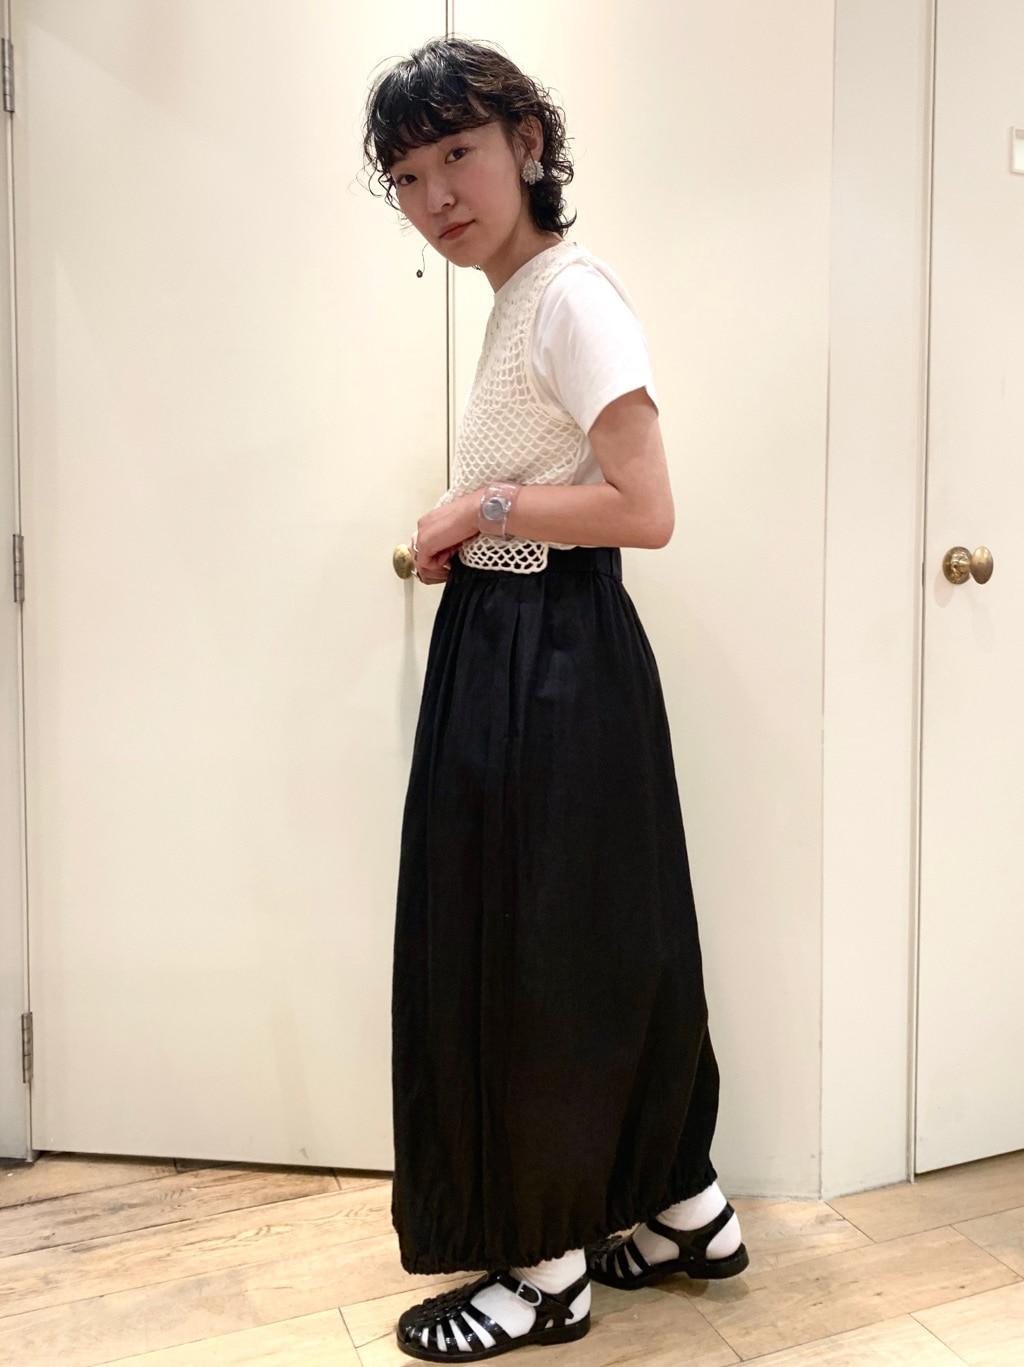 bulle de savon 新宿ミロード 身長:159cm 2020.07.17